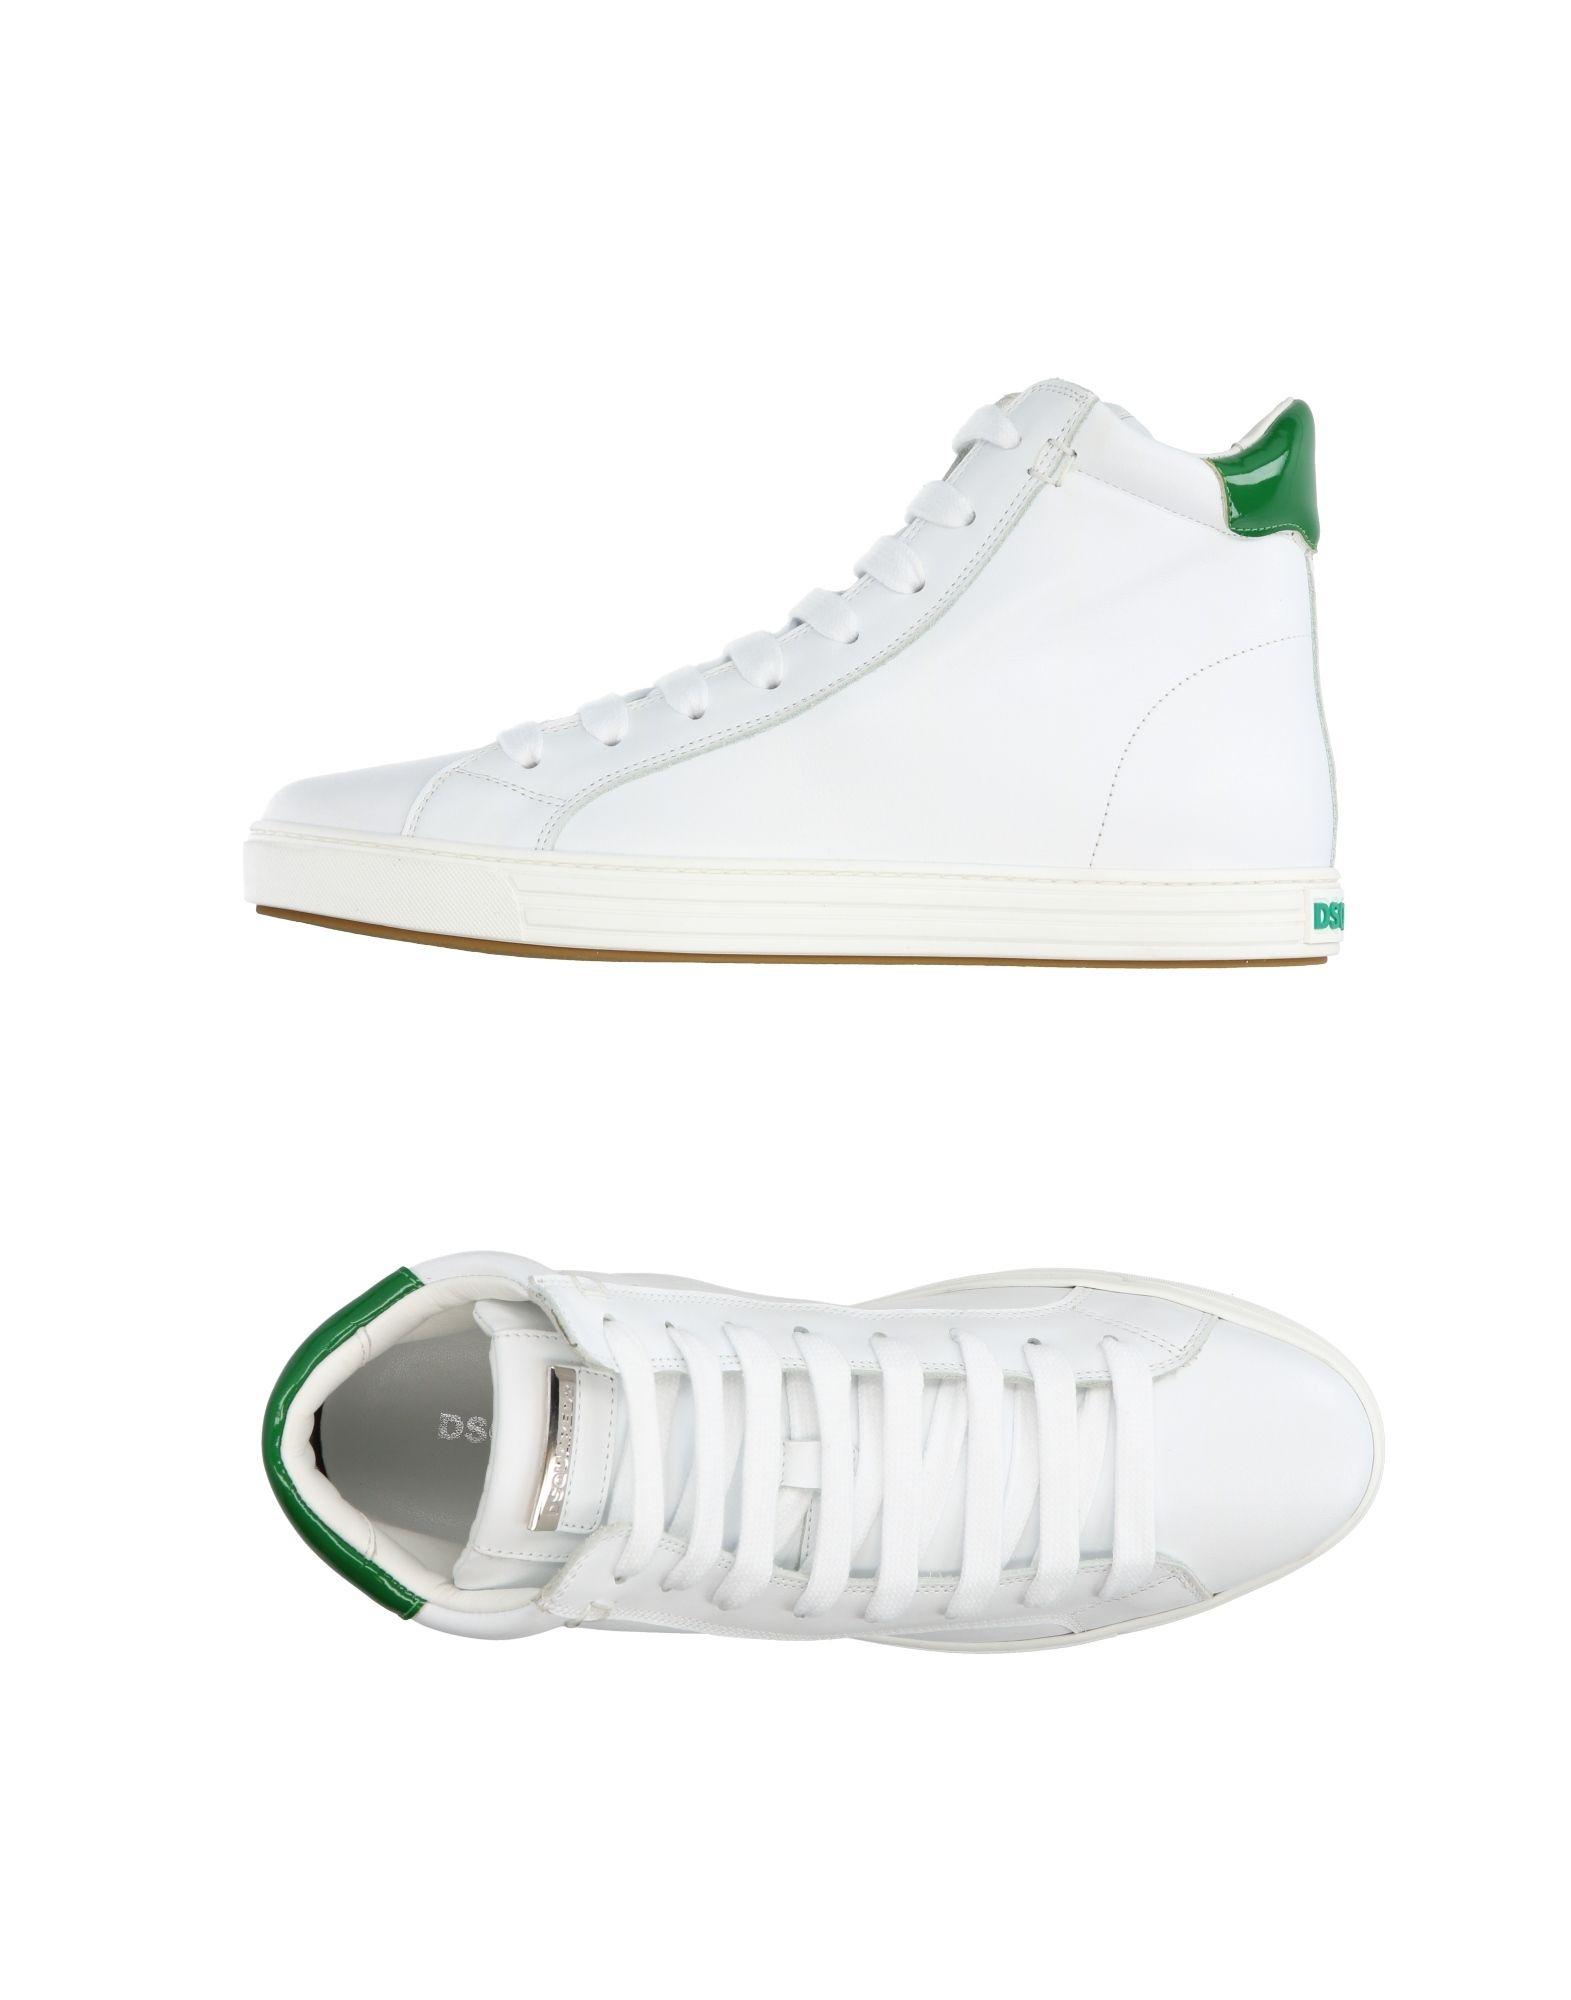 Dsquared2 Gute Sneakers Herren  11298717VX Gute Dsquared2 Qualität beliebte Schuhe 3c71ee